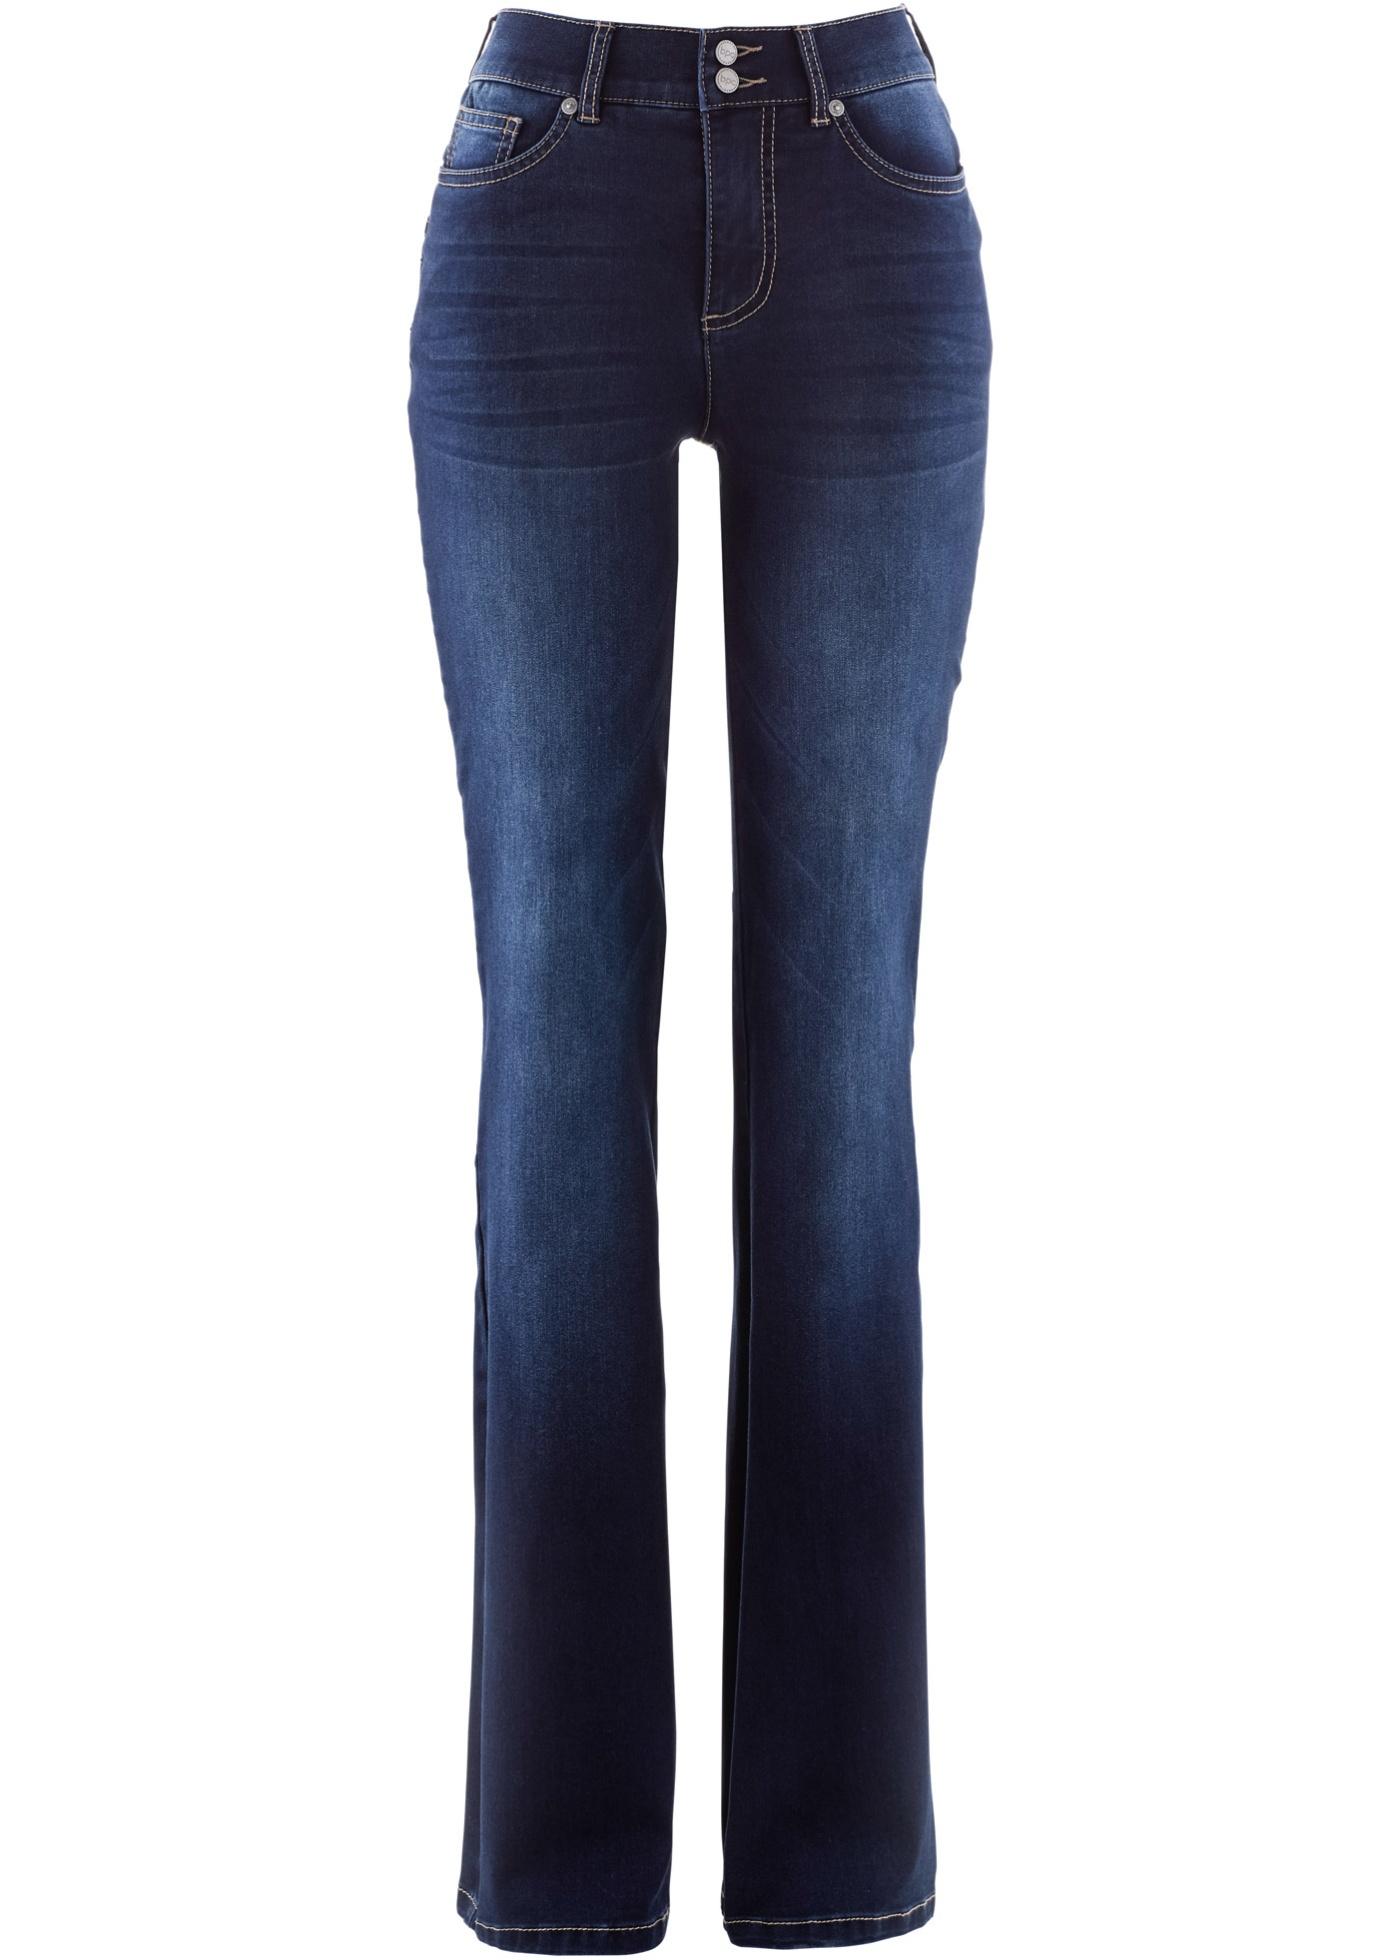 Bonprix SE - Push up-jeans, bootcutmodell 299.00